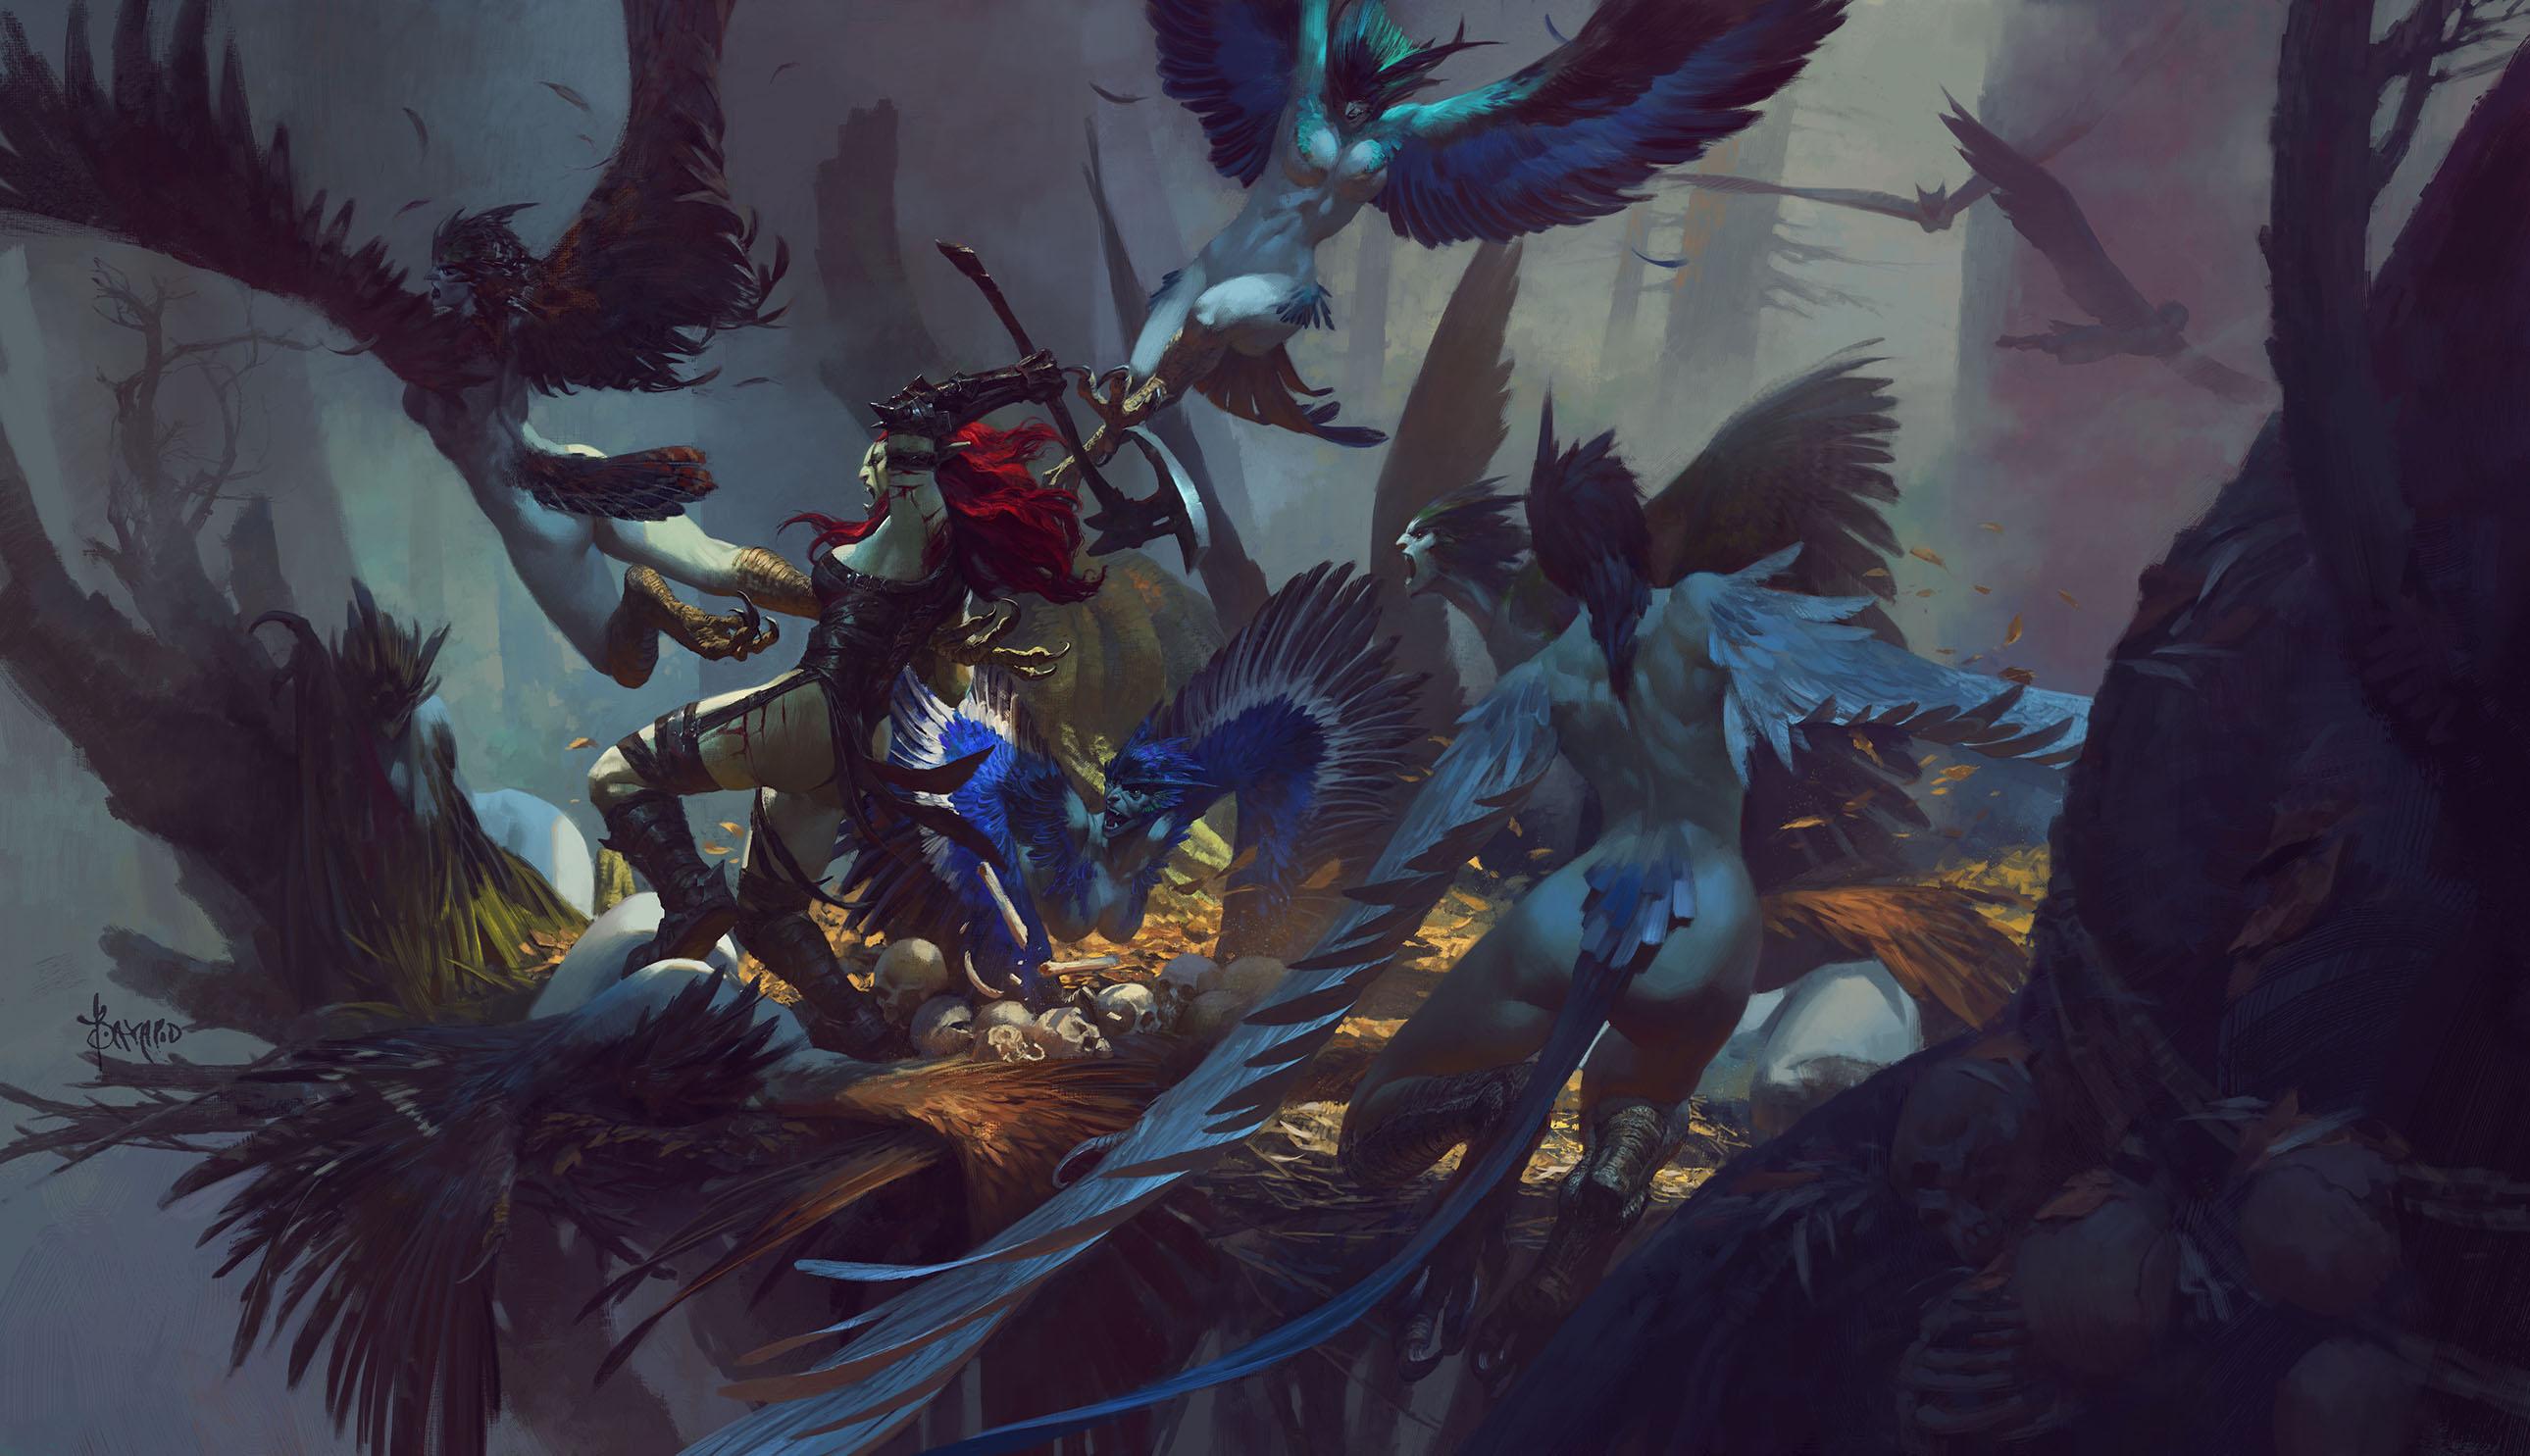 Fighting in the harpy nest